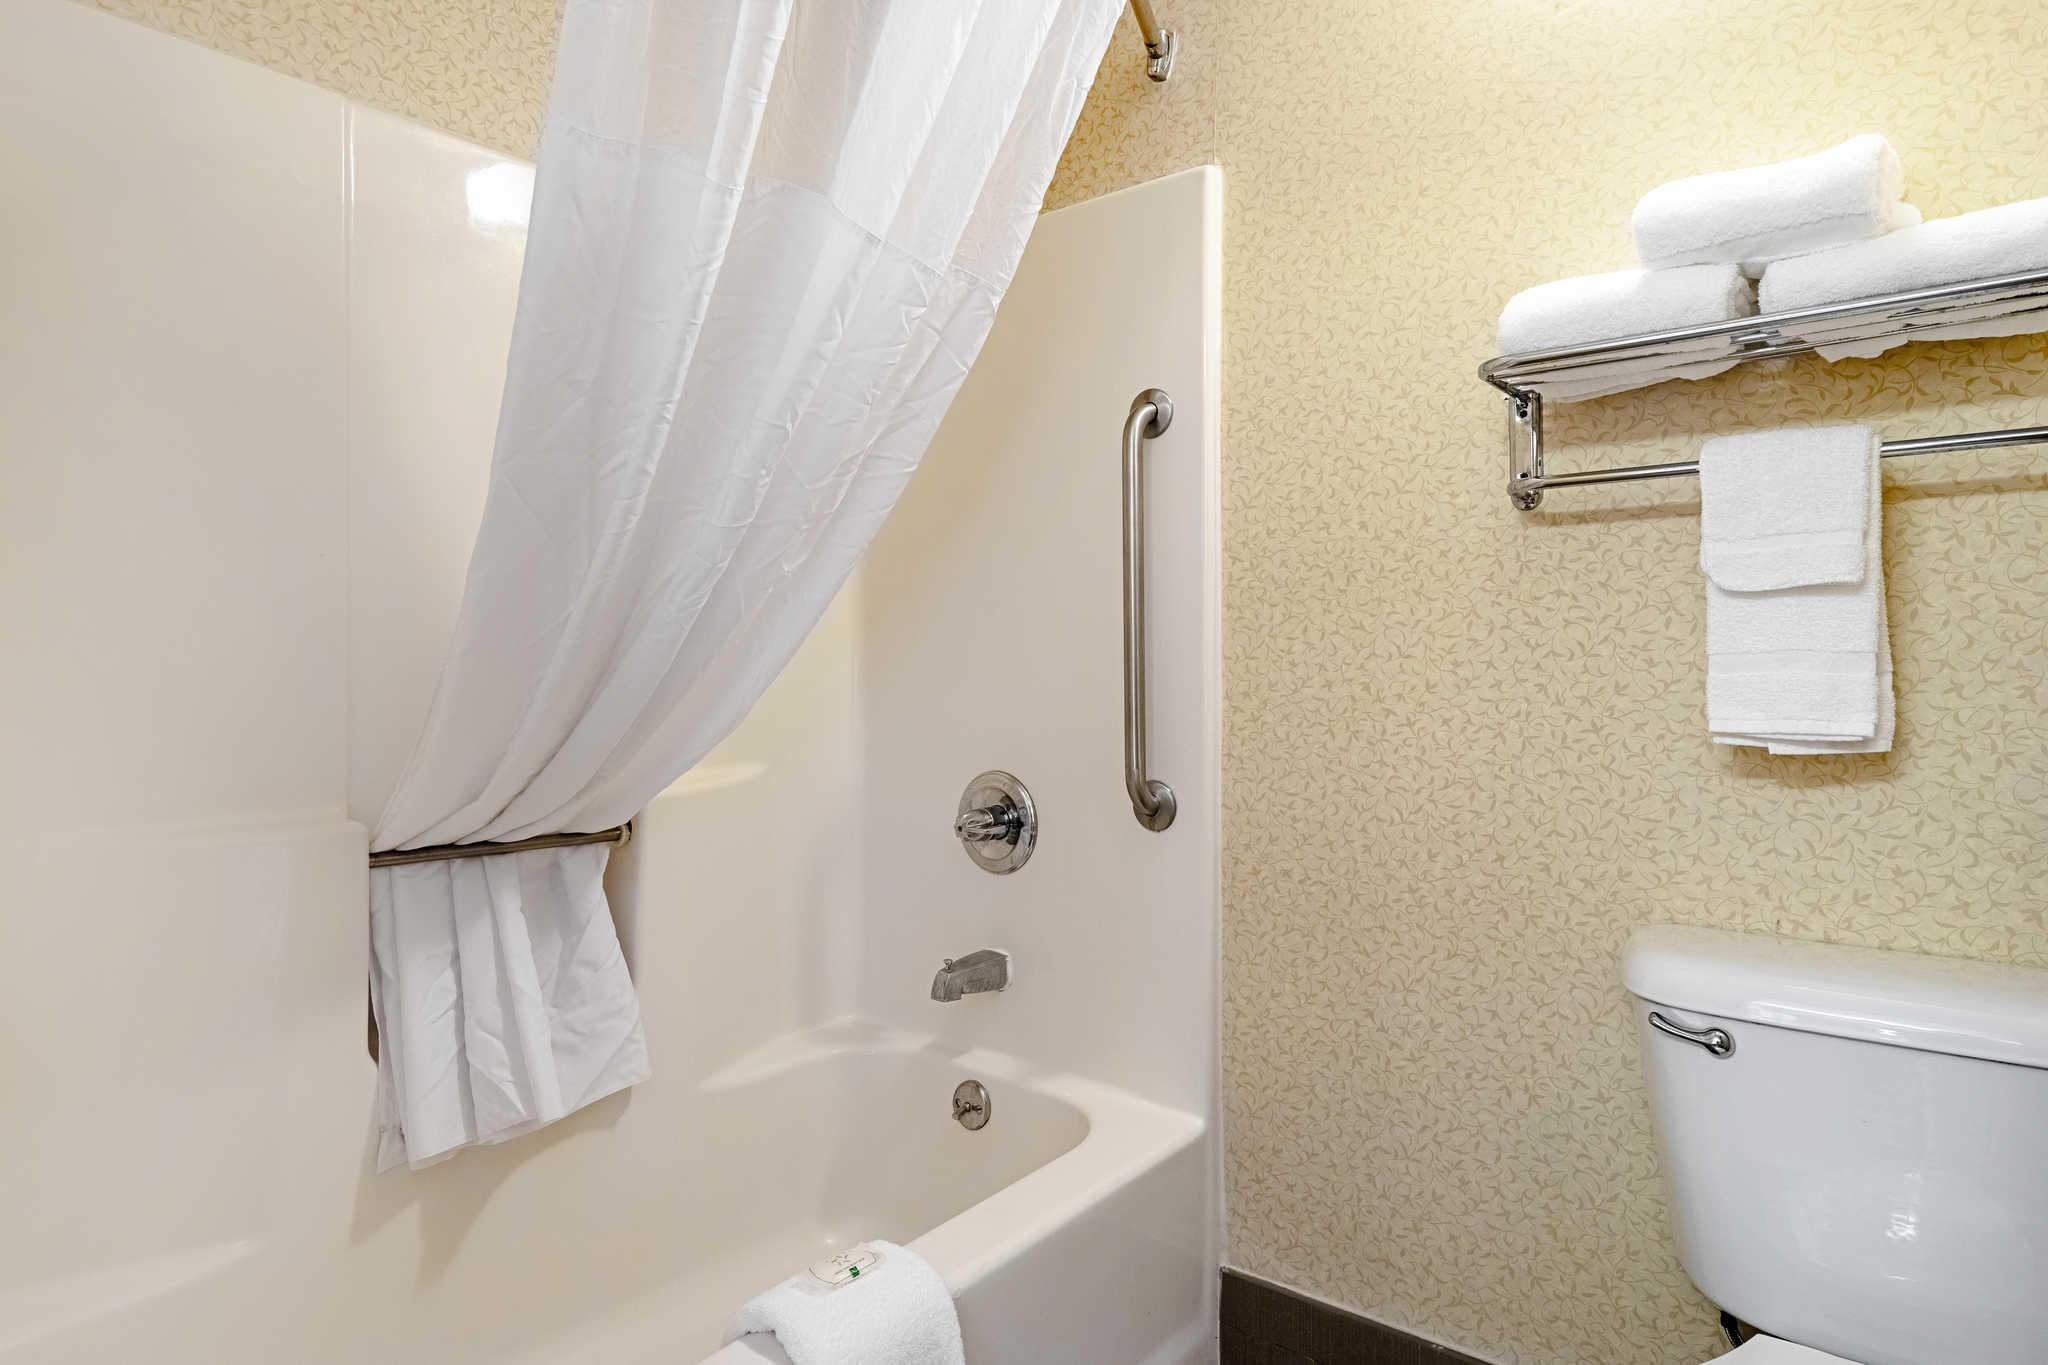 Quality Suites image 15